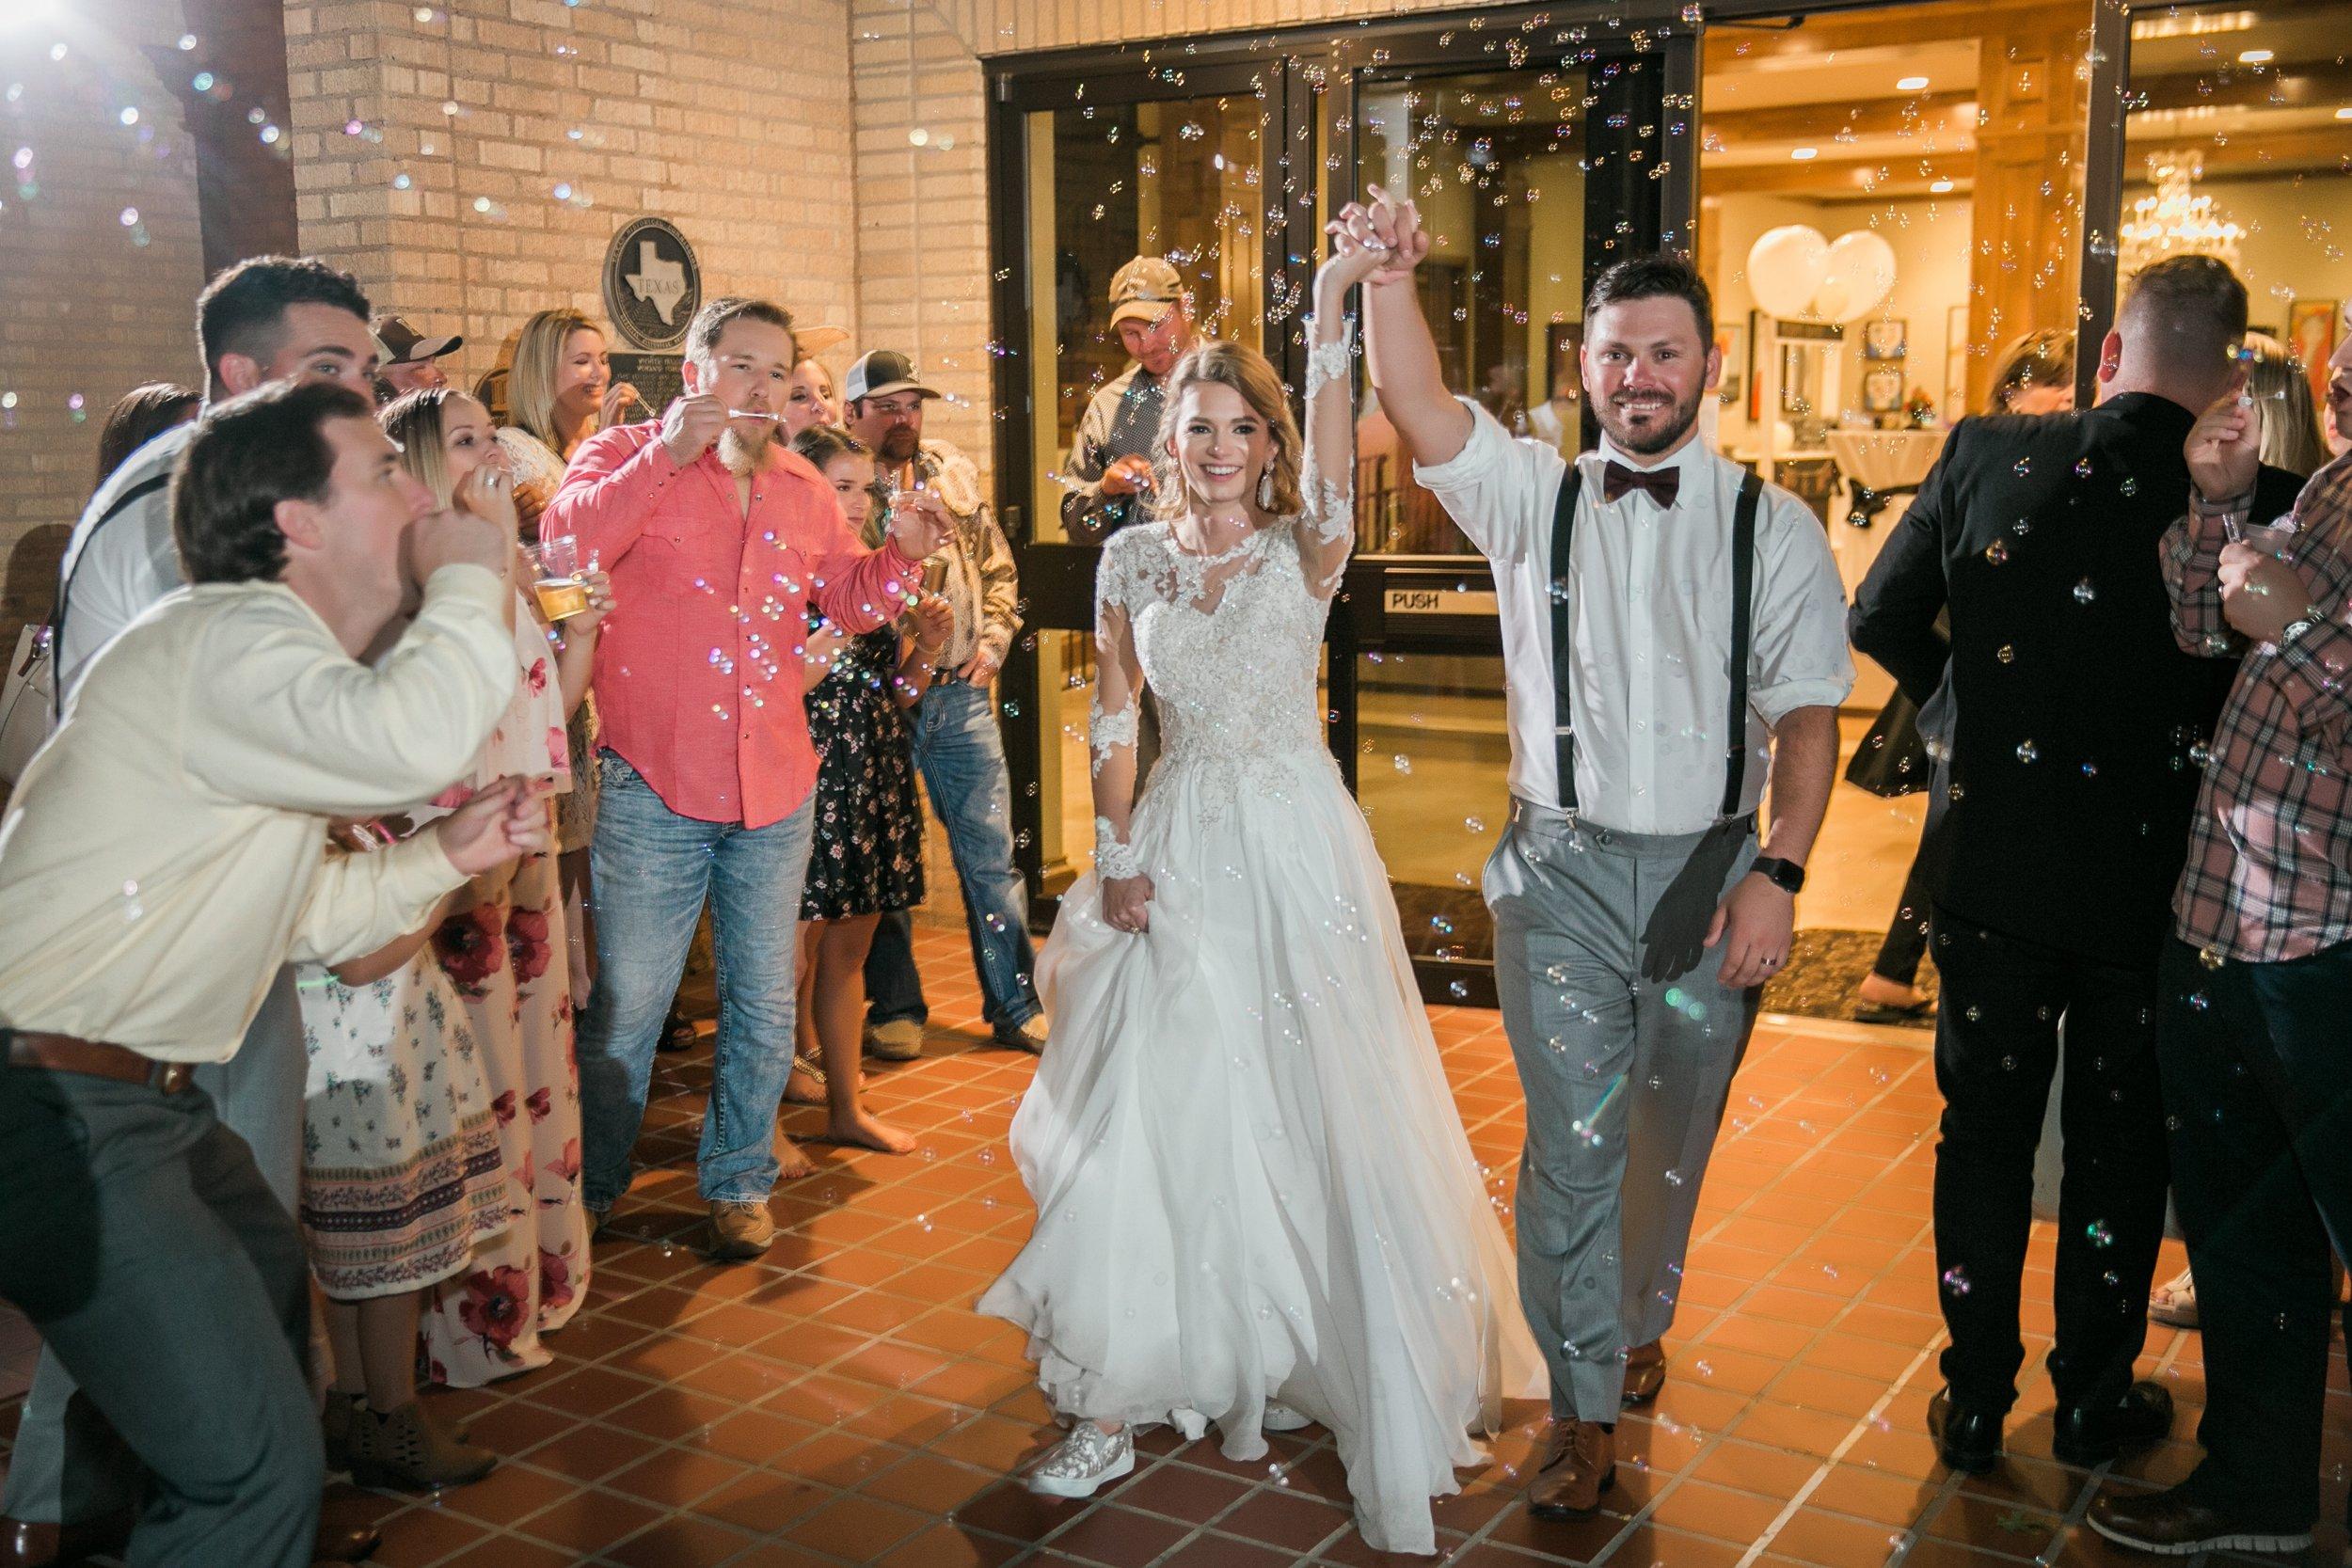 Roberson-Wedding-The-Forum-Lauren-Pinson-Wedding-Photography-Wichita-Falls-Texas-088.jpg